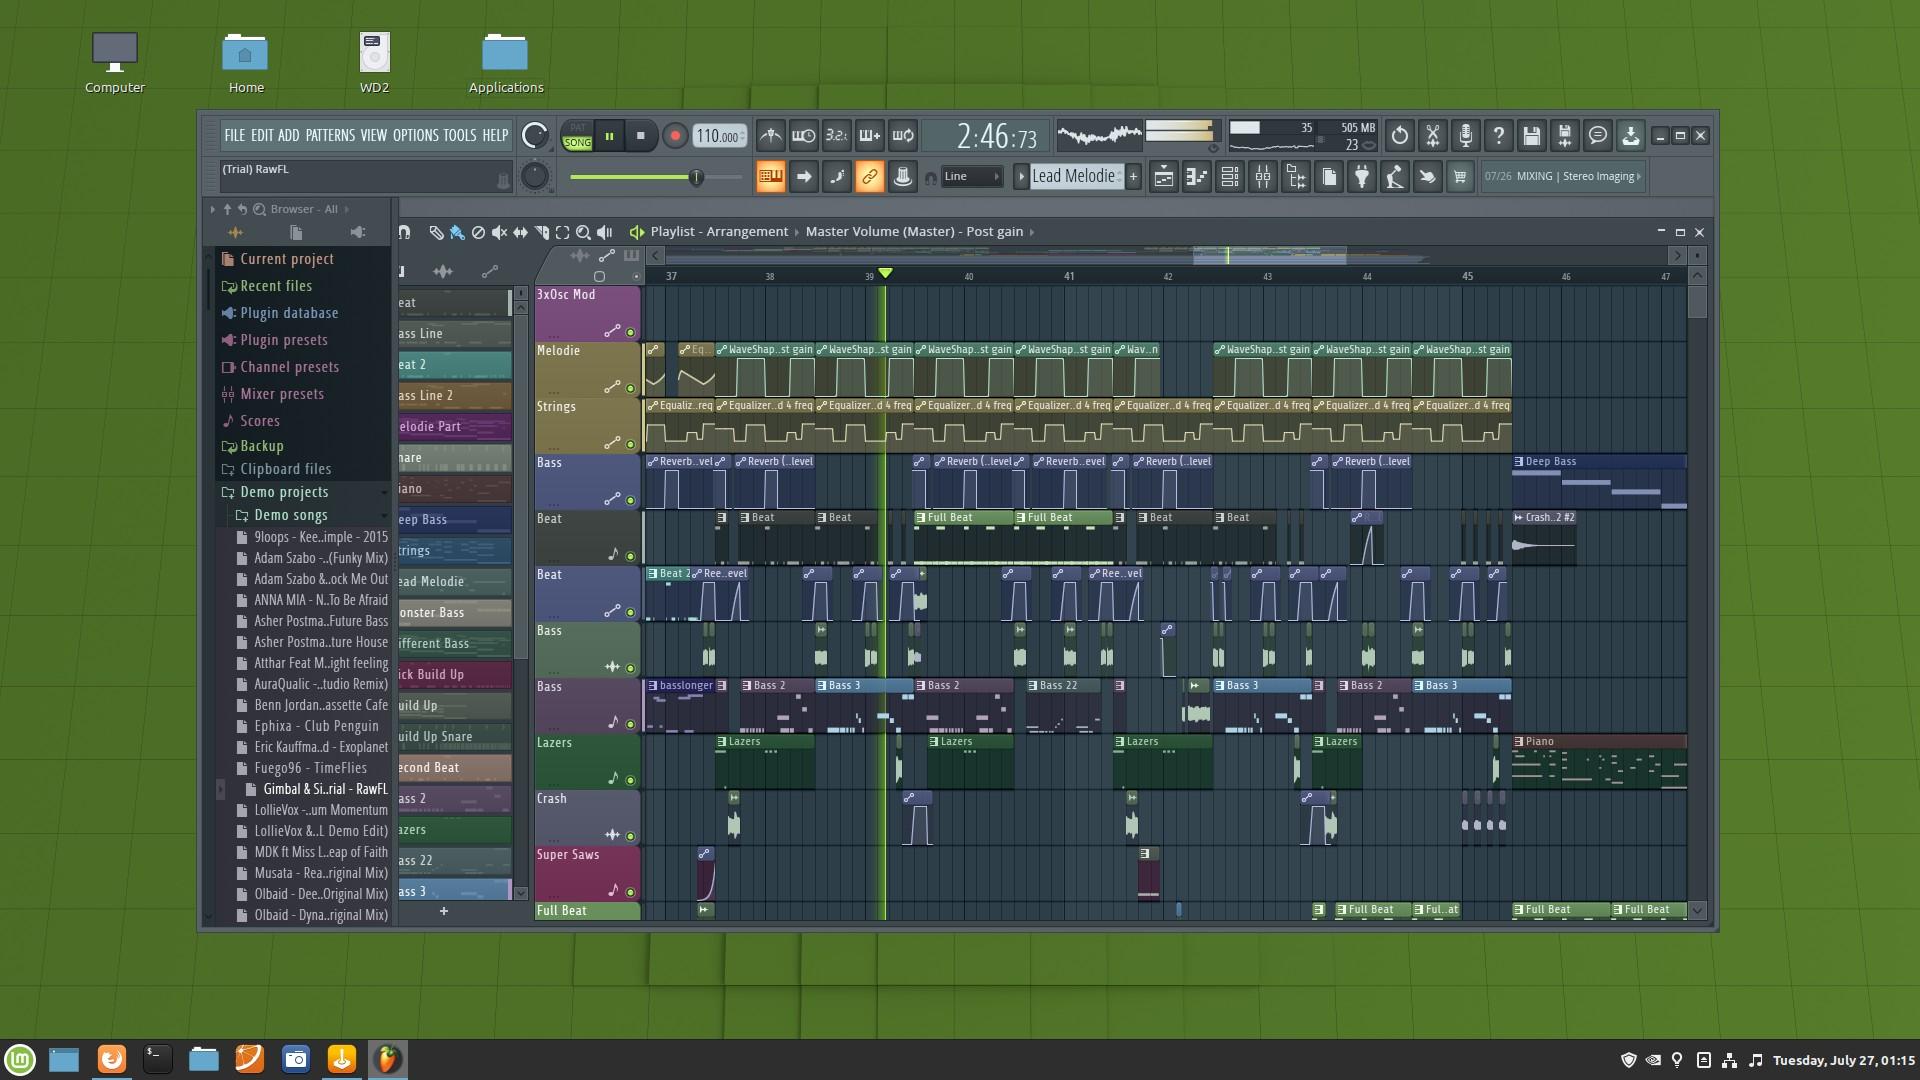 FL Studio 20 running in Lutris on Linux Mint